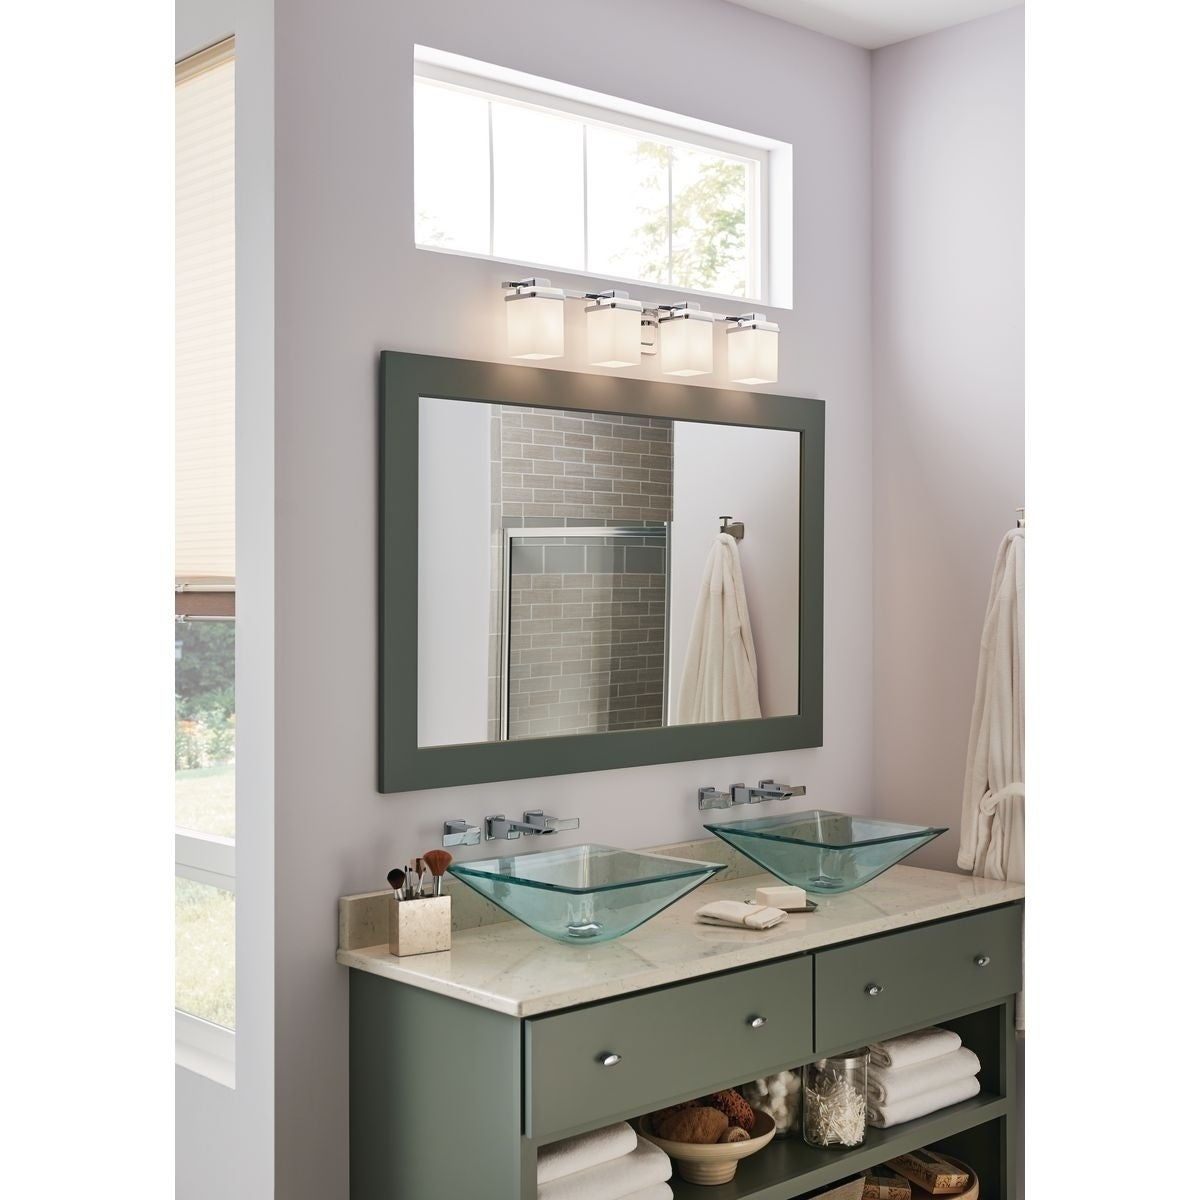 Progress Lighting Metric Collection 3Light Polished Chrome Bathroom Vanity Light